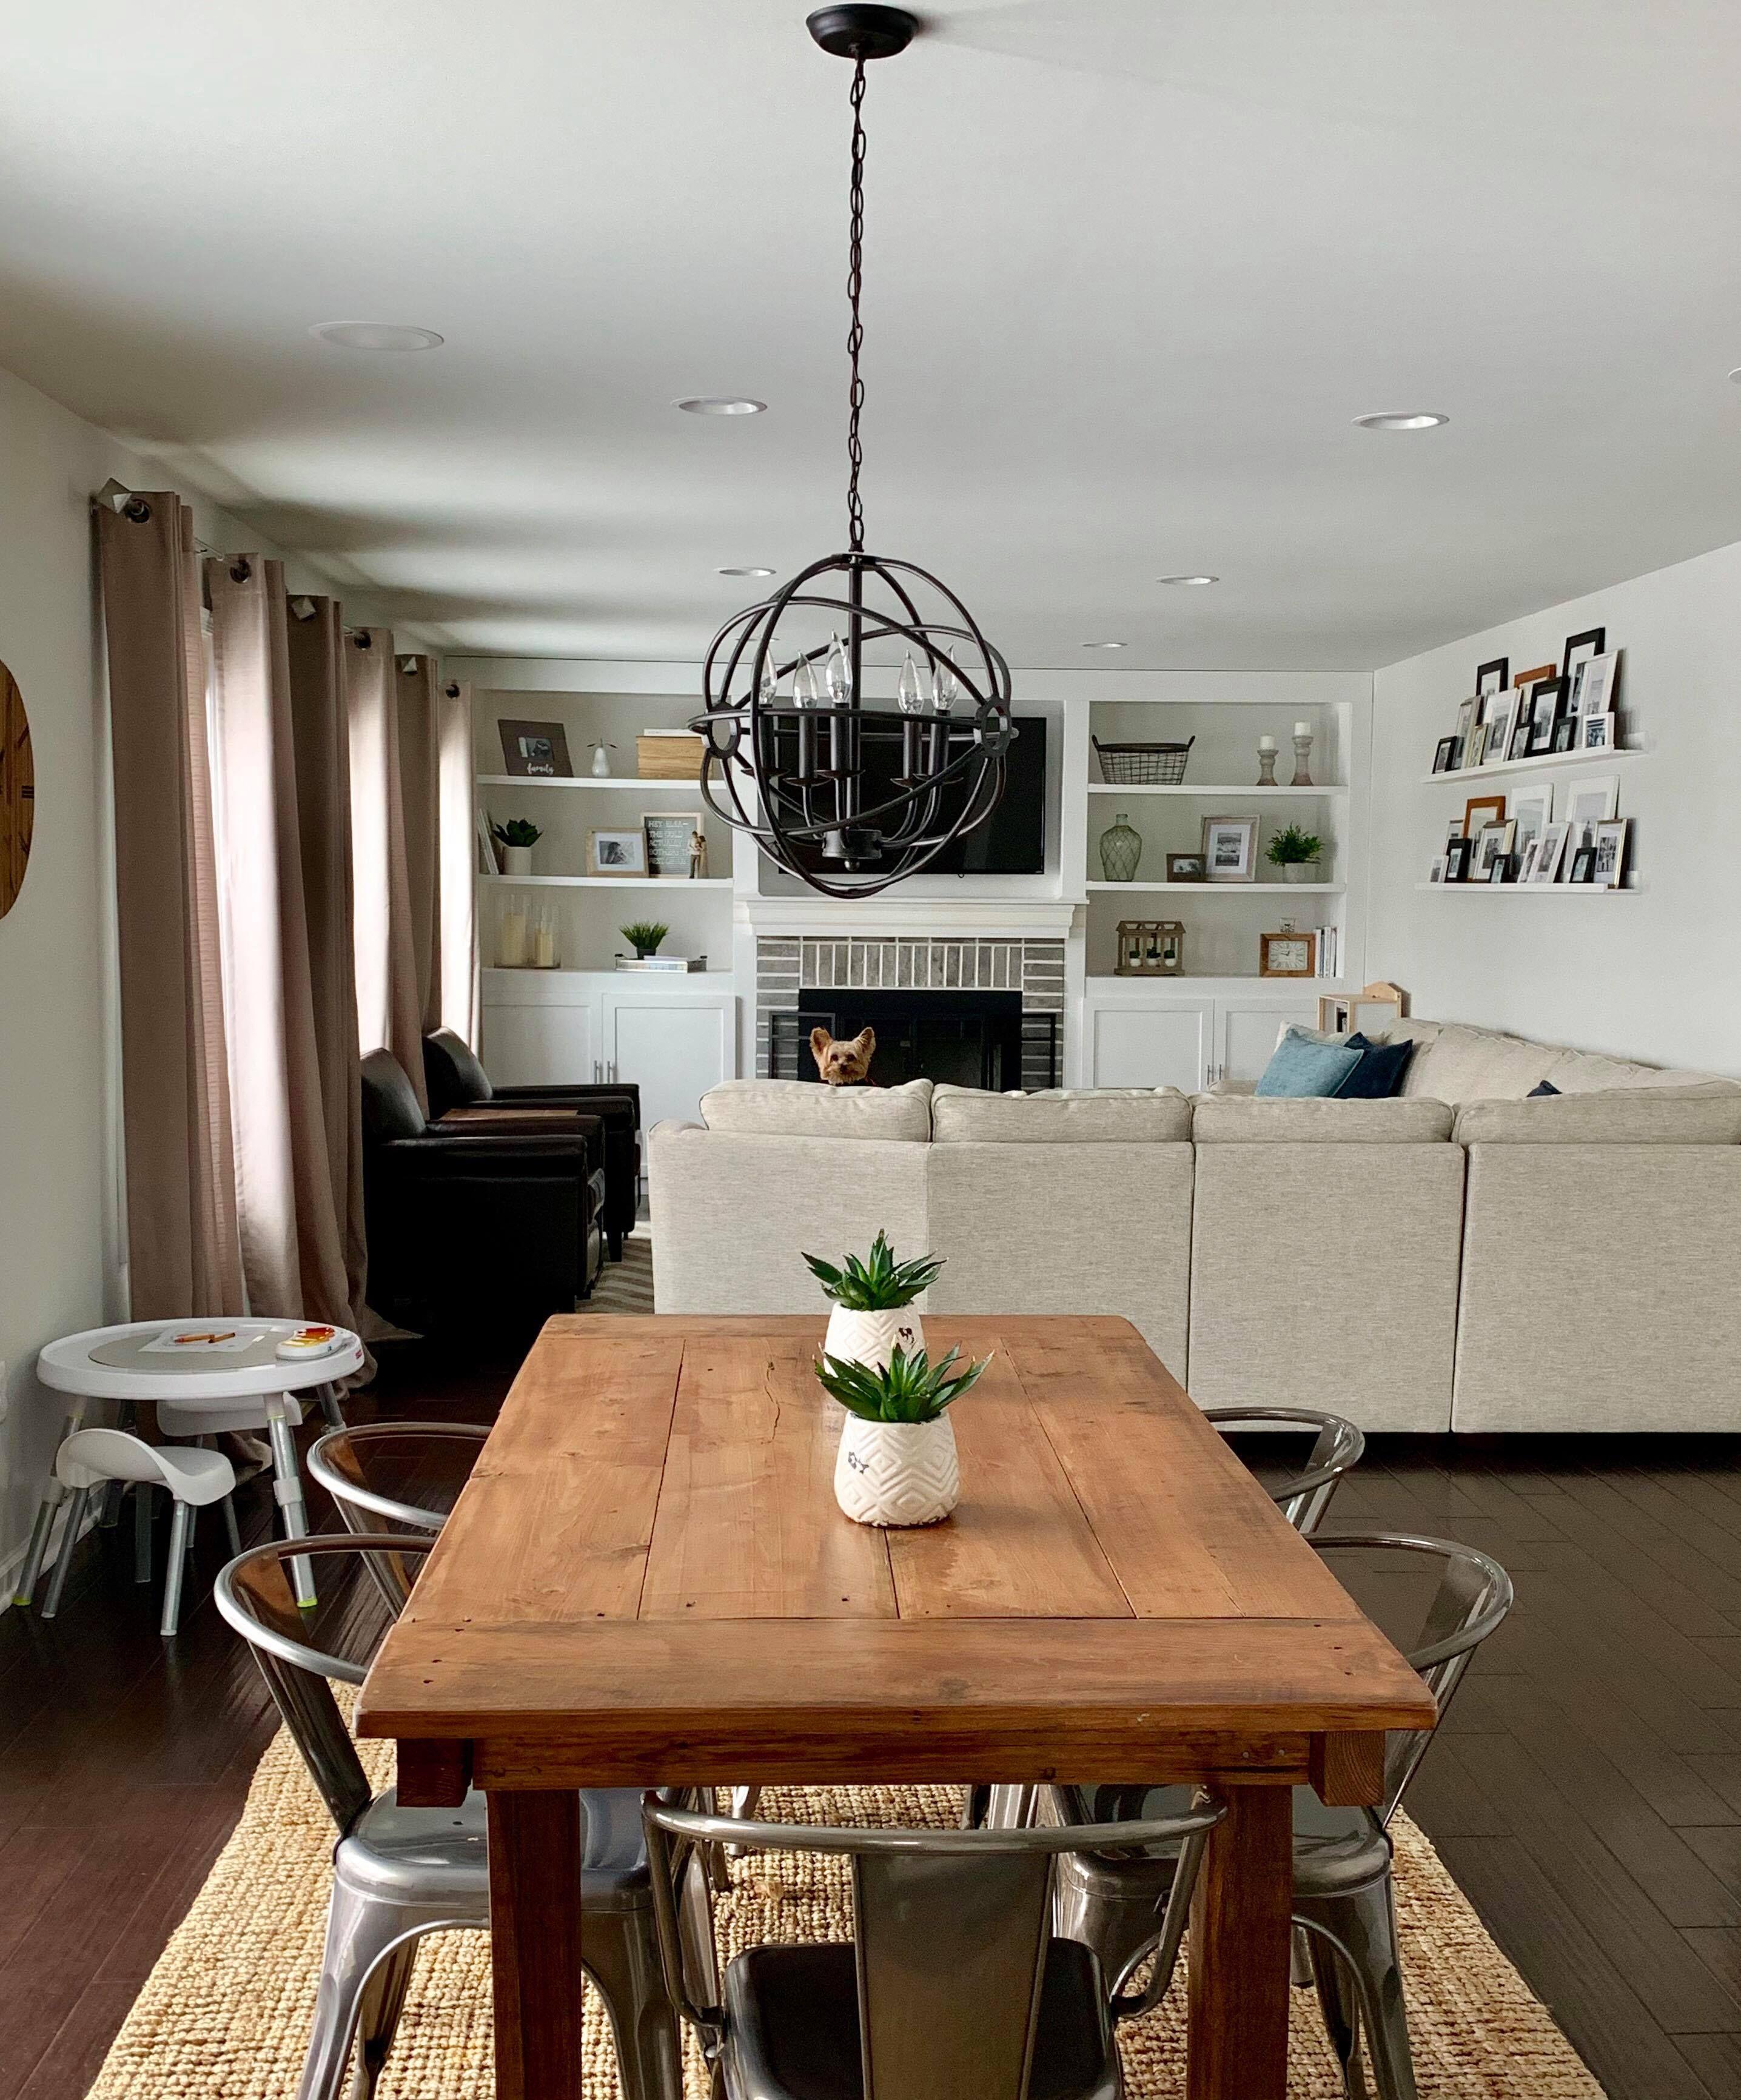 Farmhouse Dining Table Custom Built Design Your Own Table With The